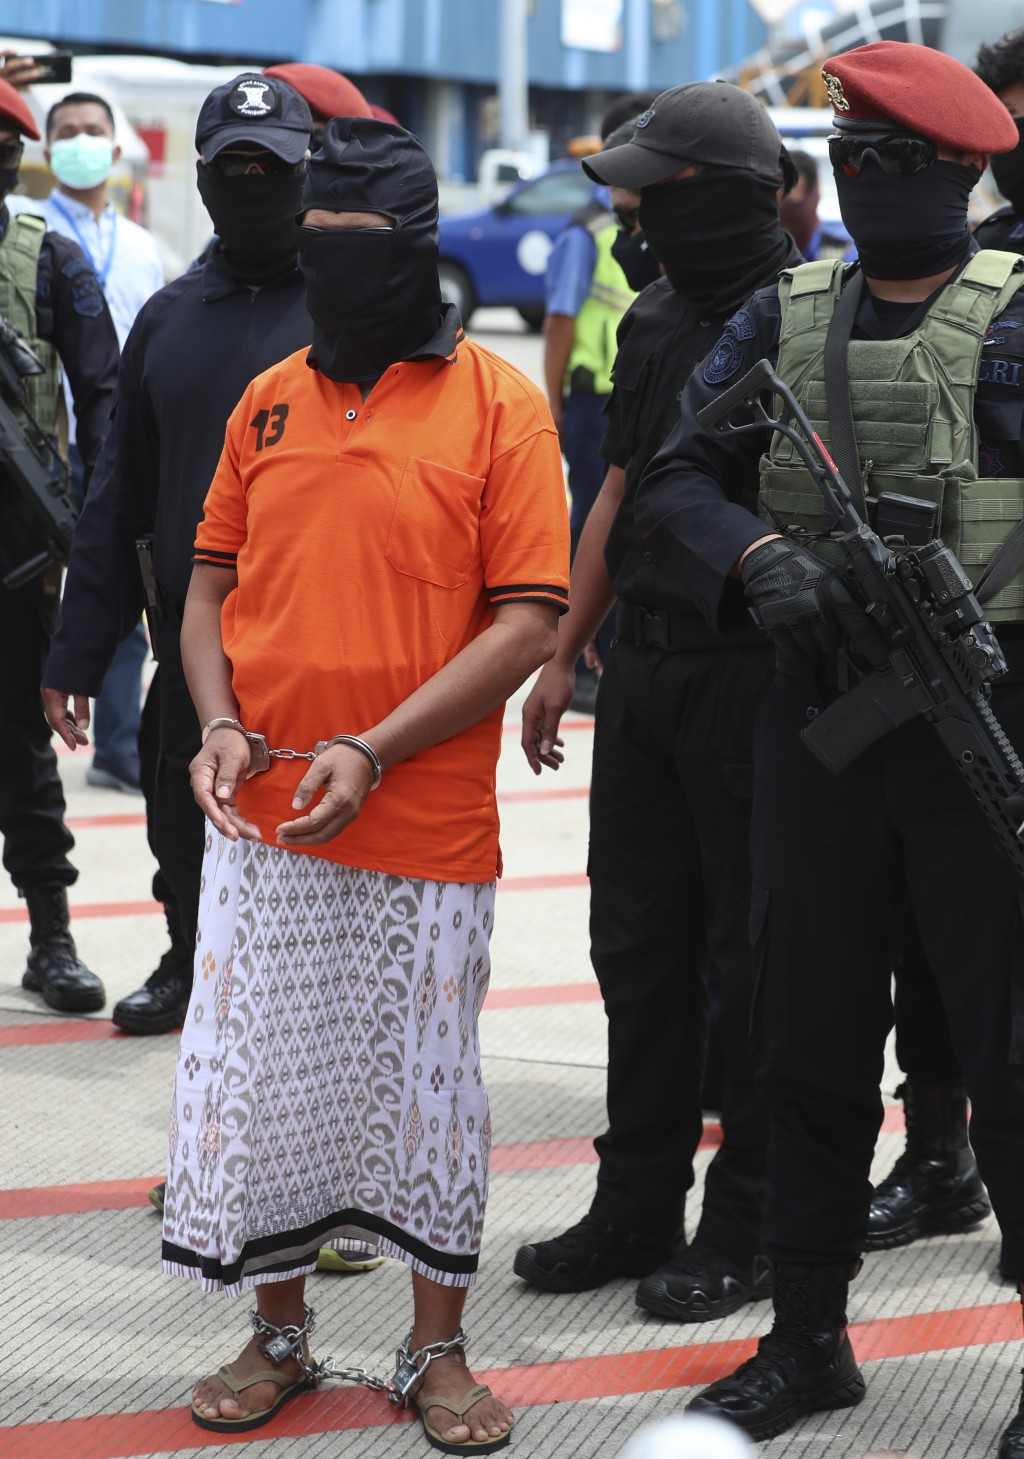 Police officers escort suspected militant Zulkarnaen, center, who is also known as Aris Sumarsono, upon arrival at Soekarno-Hatta International Airpor...